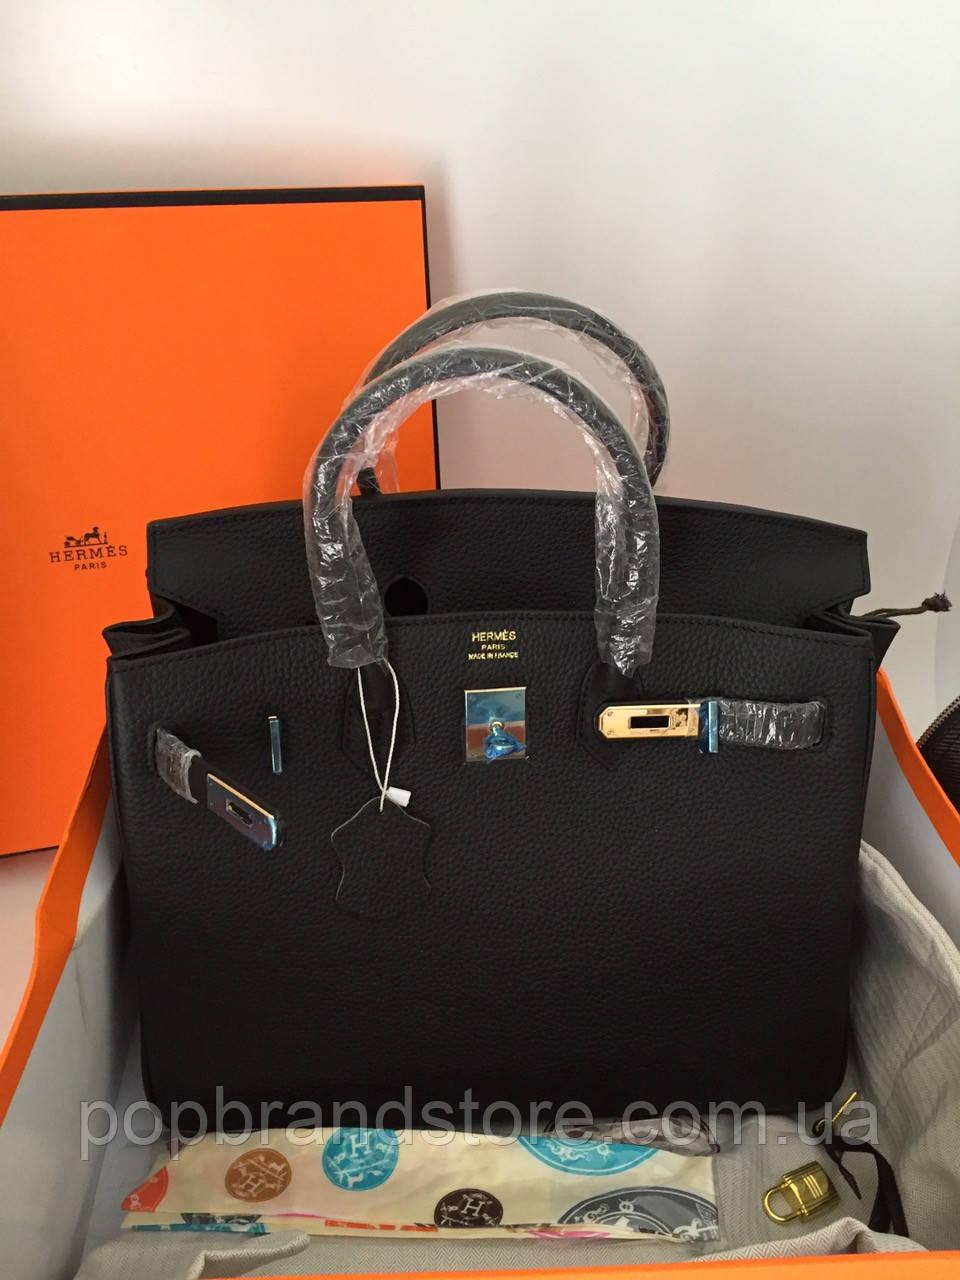 262adb6c6d1f Женская сумка Hermes Birkin 35 см натуральная кожа - Pop Brand Store | брендовые  сумки,